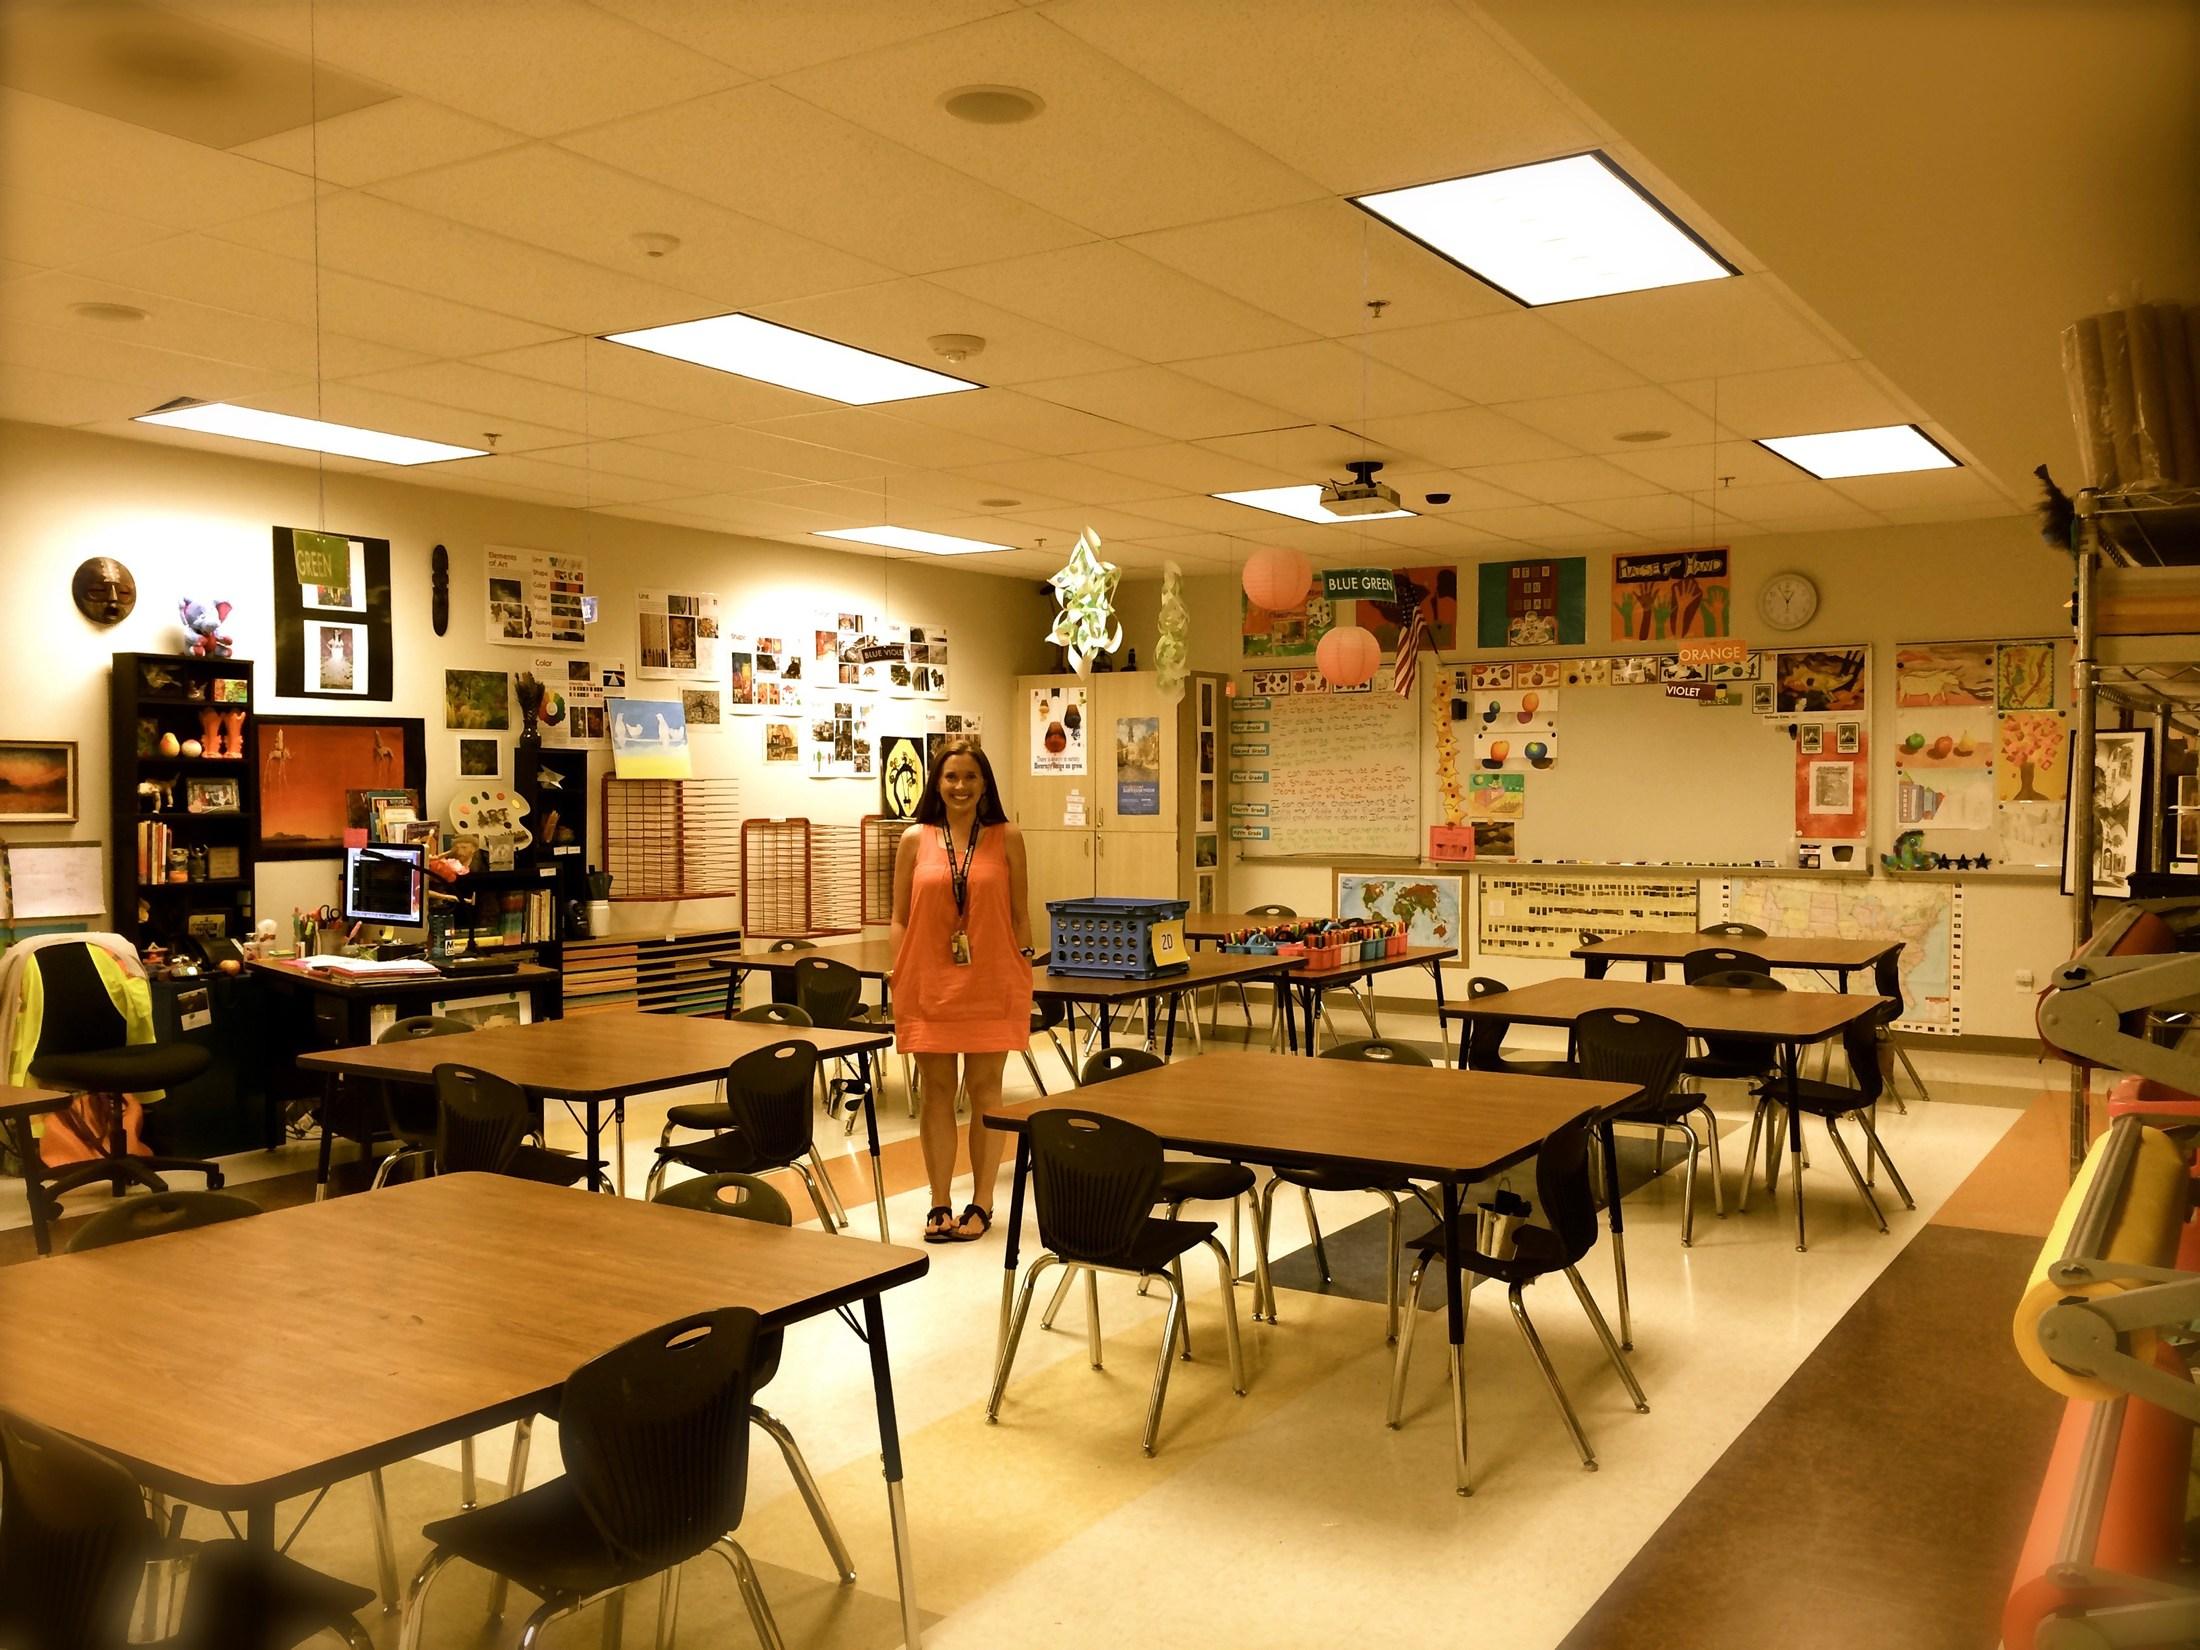 Elementary Art Classroom